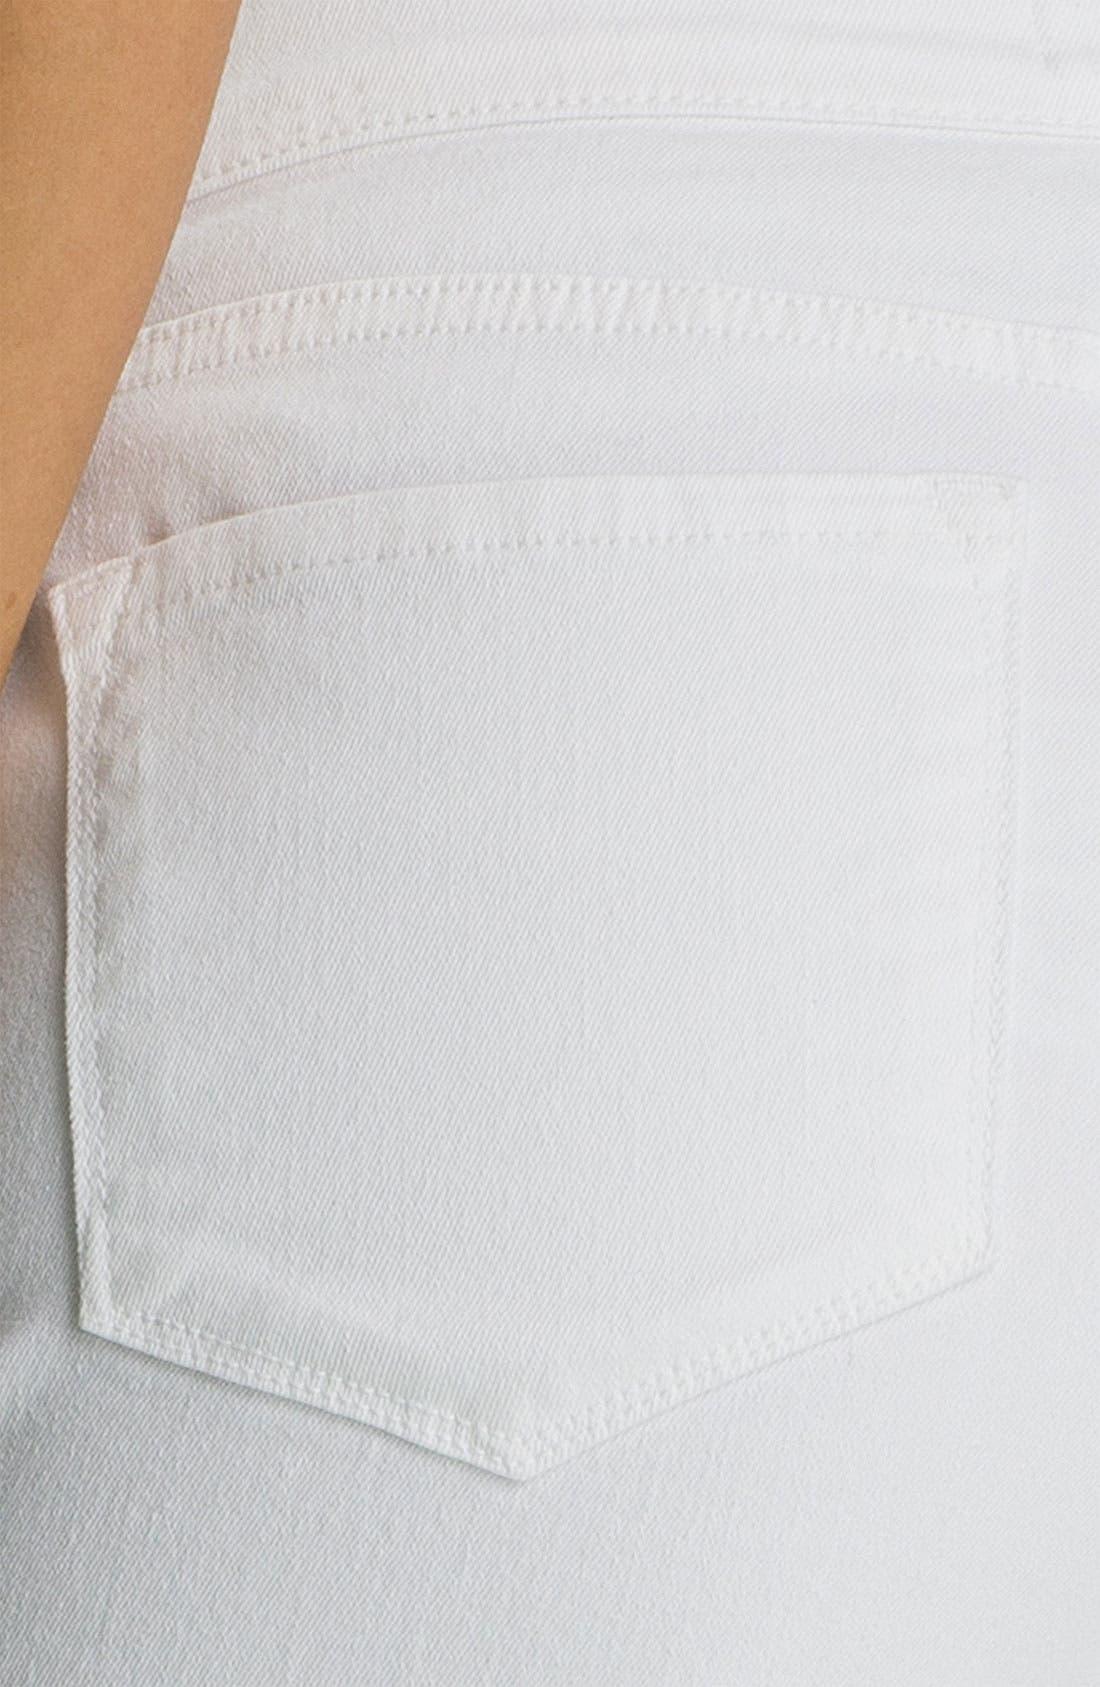 'Alyssia' Embellished Crop Jeans,                             Alternate thumbnail 3, color,                             103